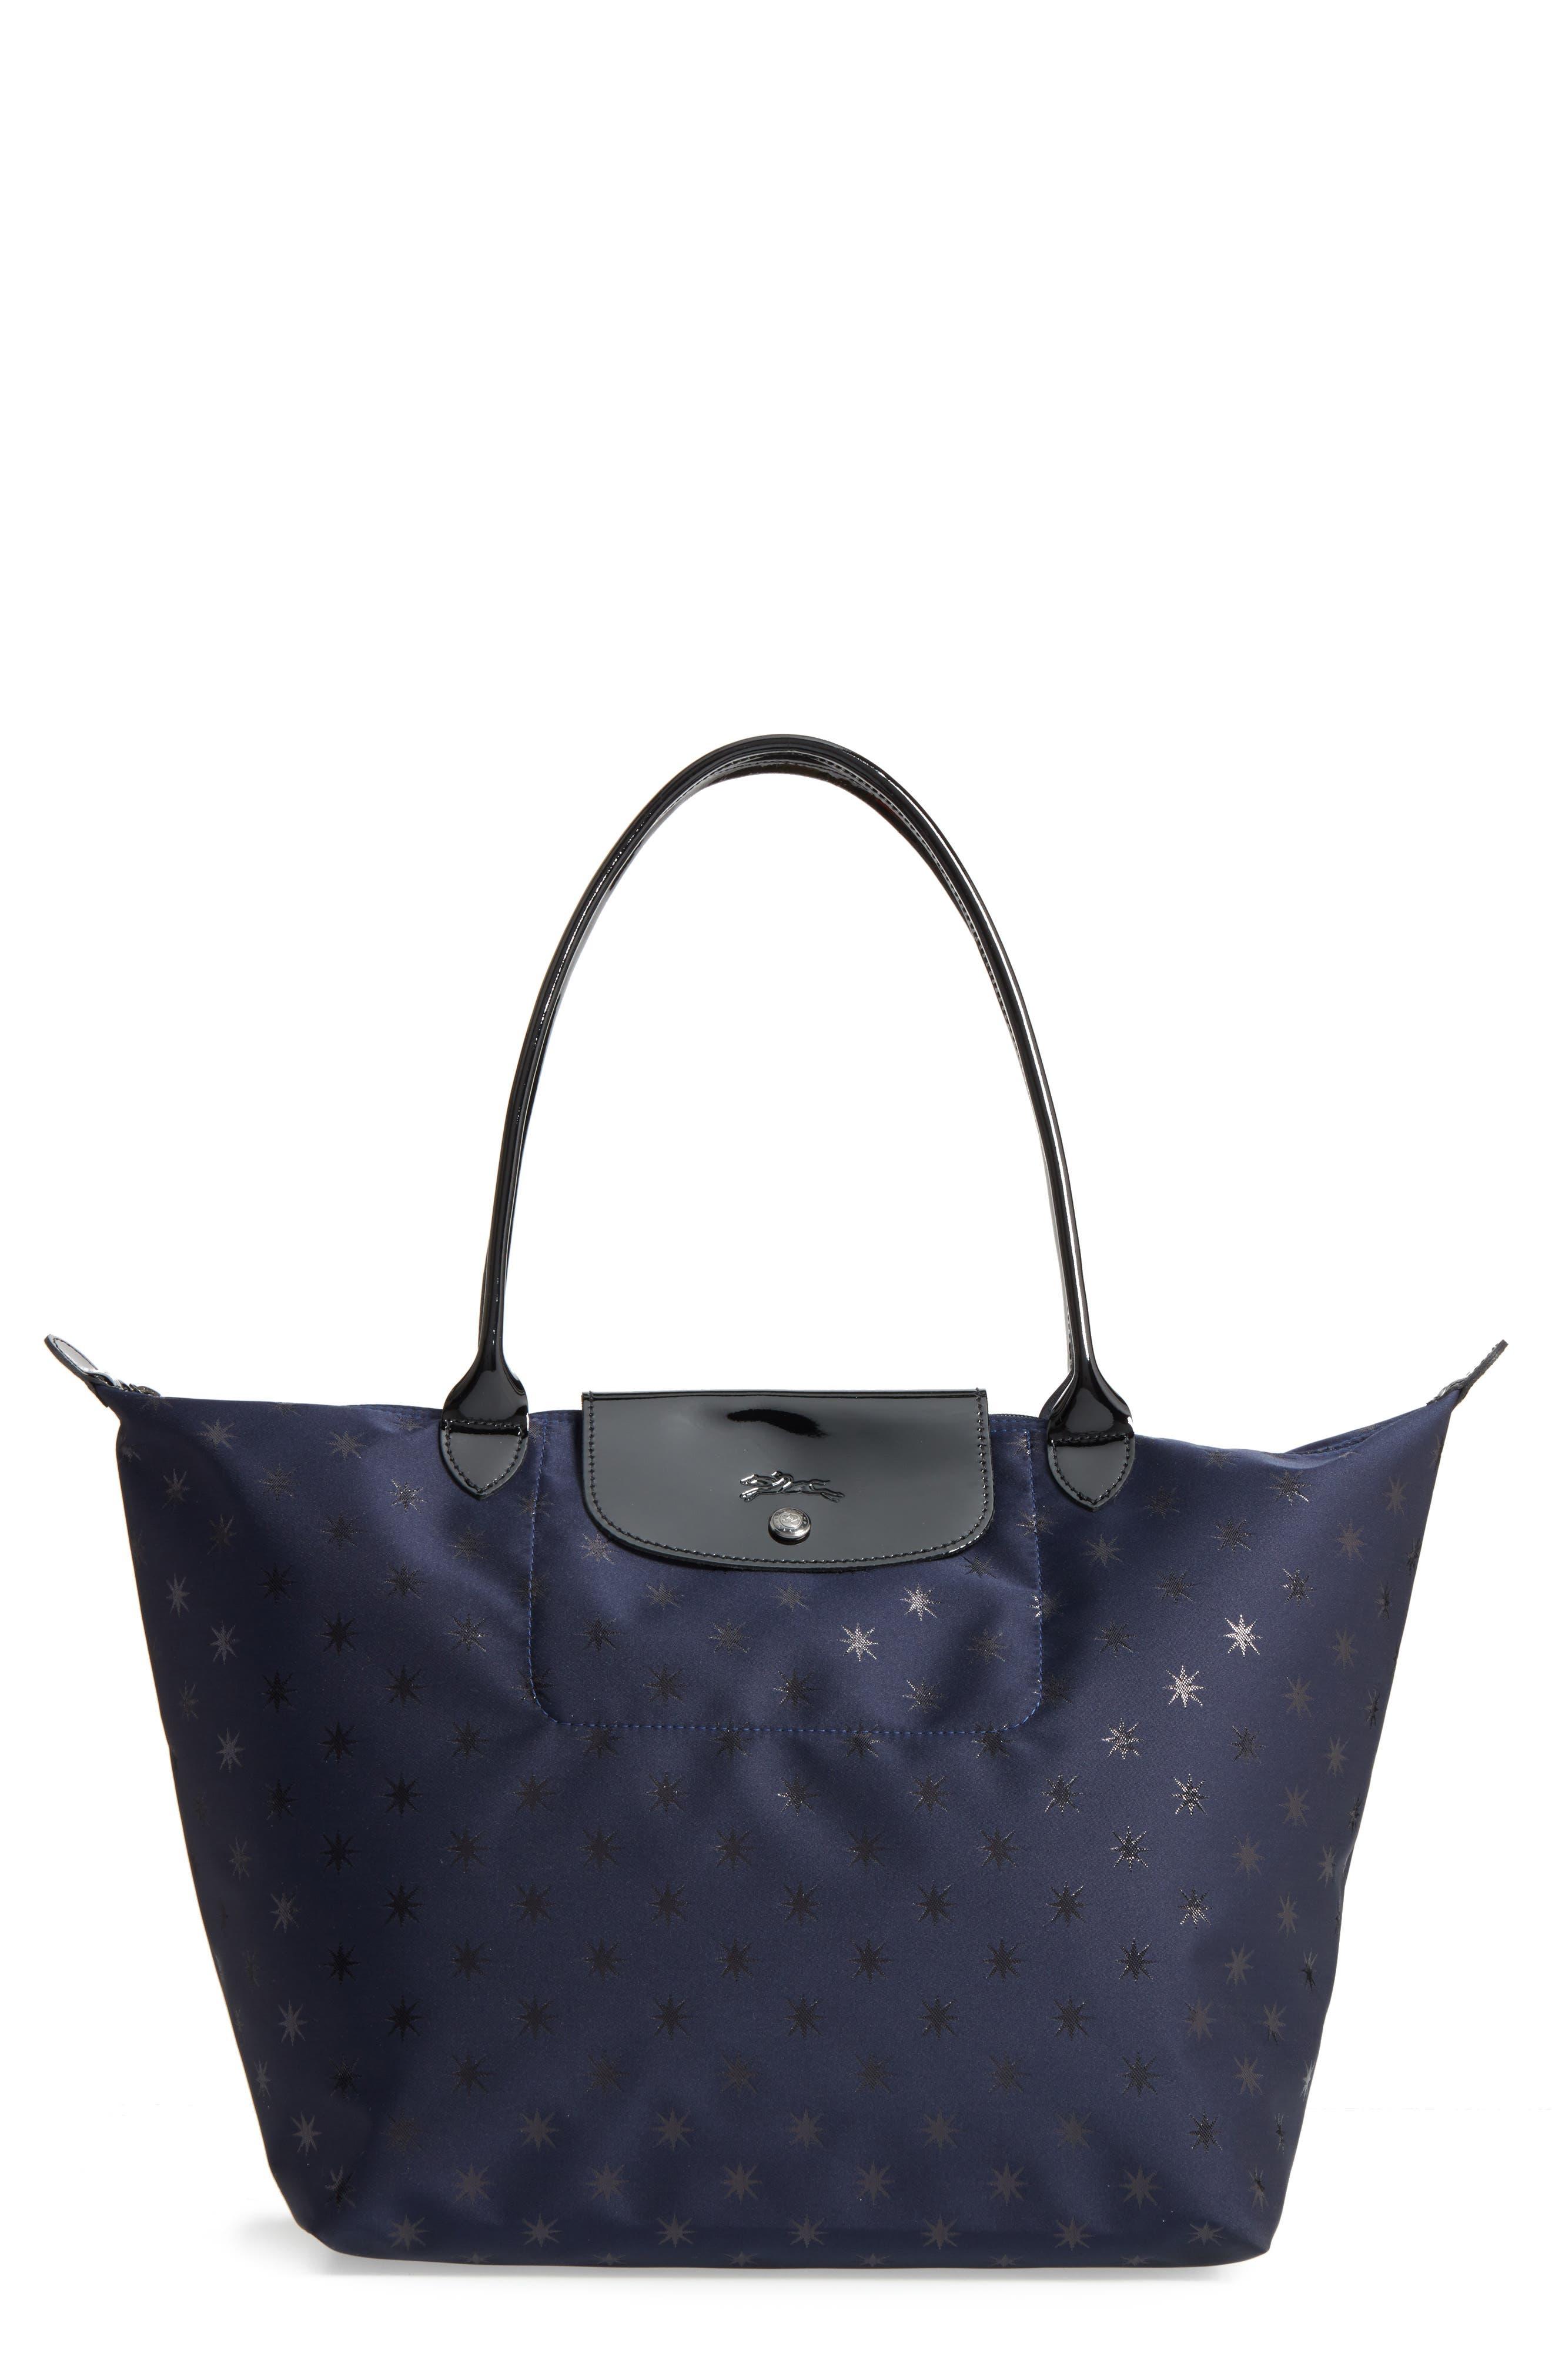 Longchamp Bag Le Pliage House Of Fraser : Longchamp le pliage cuir etoiles tote